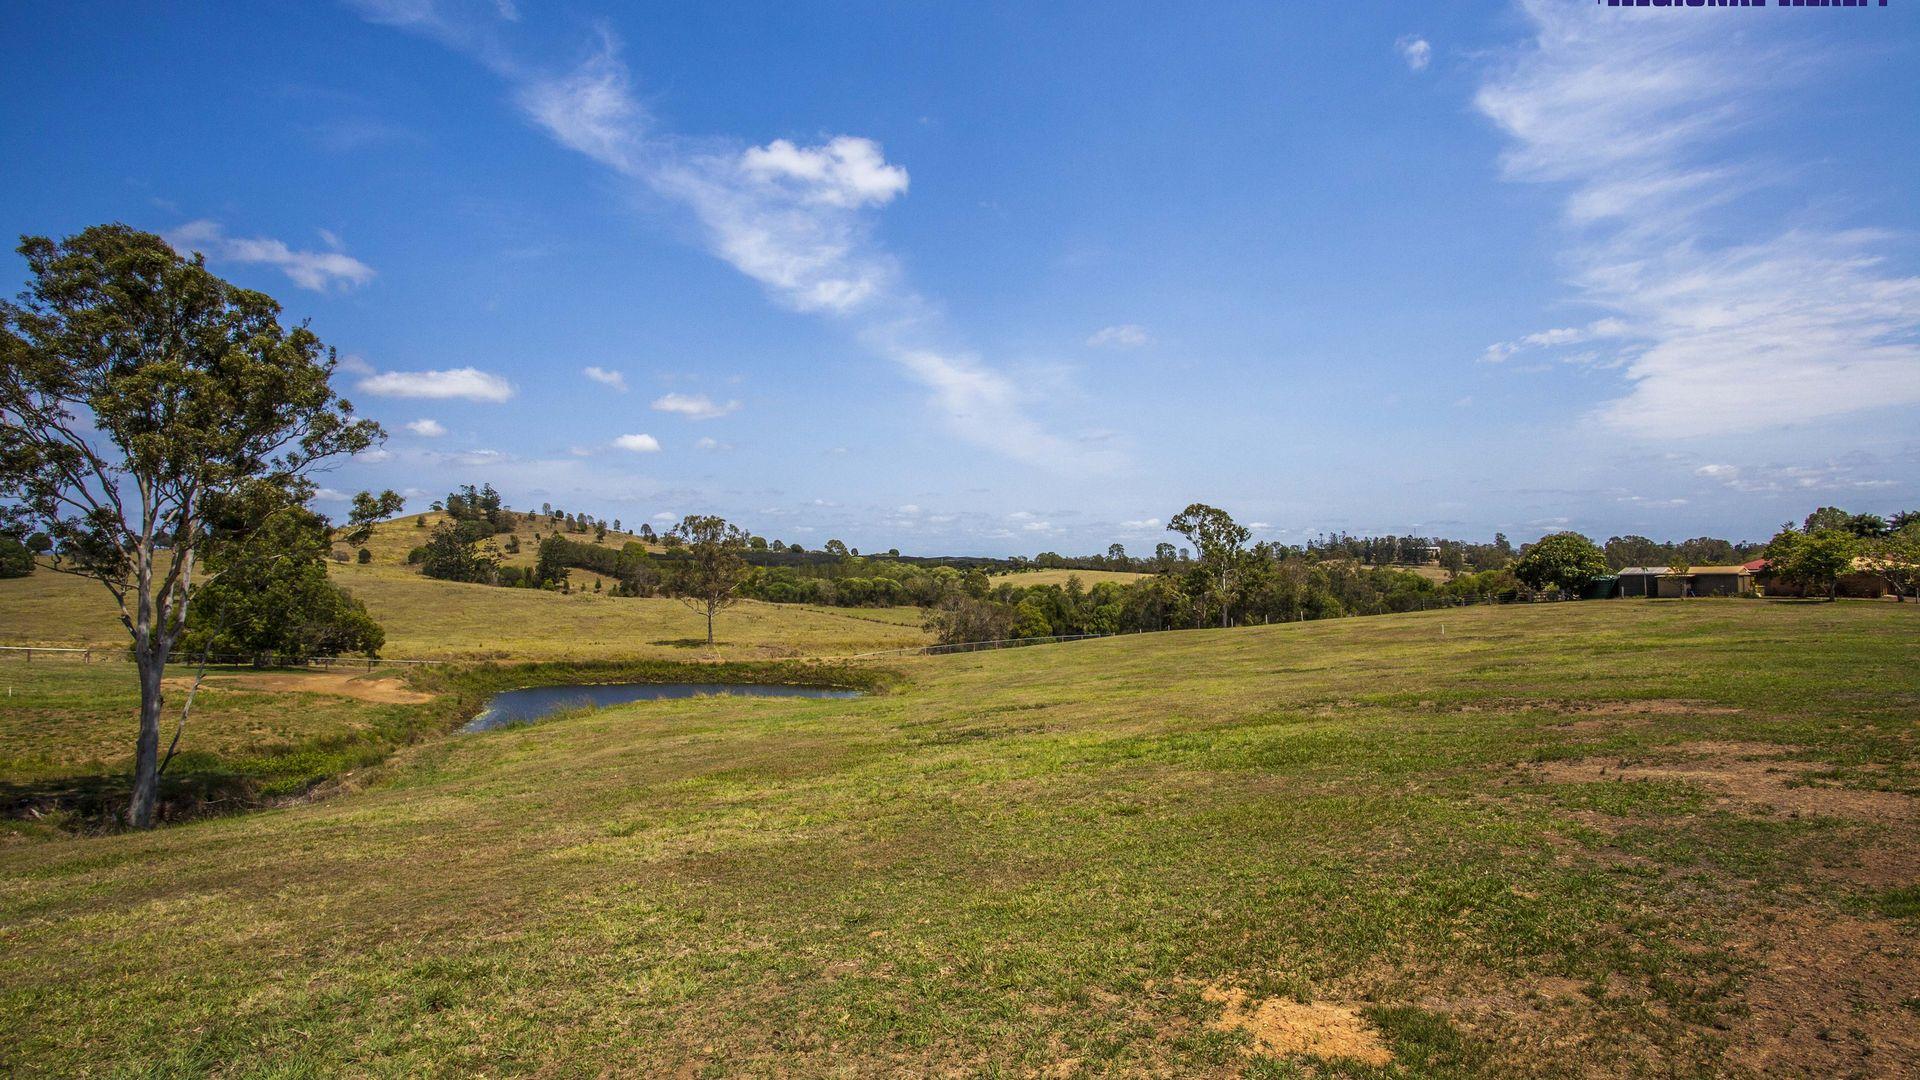 Lot 4 McIntosh Crk Rd - Grange Estate, McIntosh Creek QLD 4570, Image 1